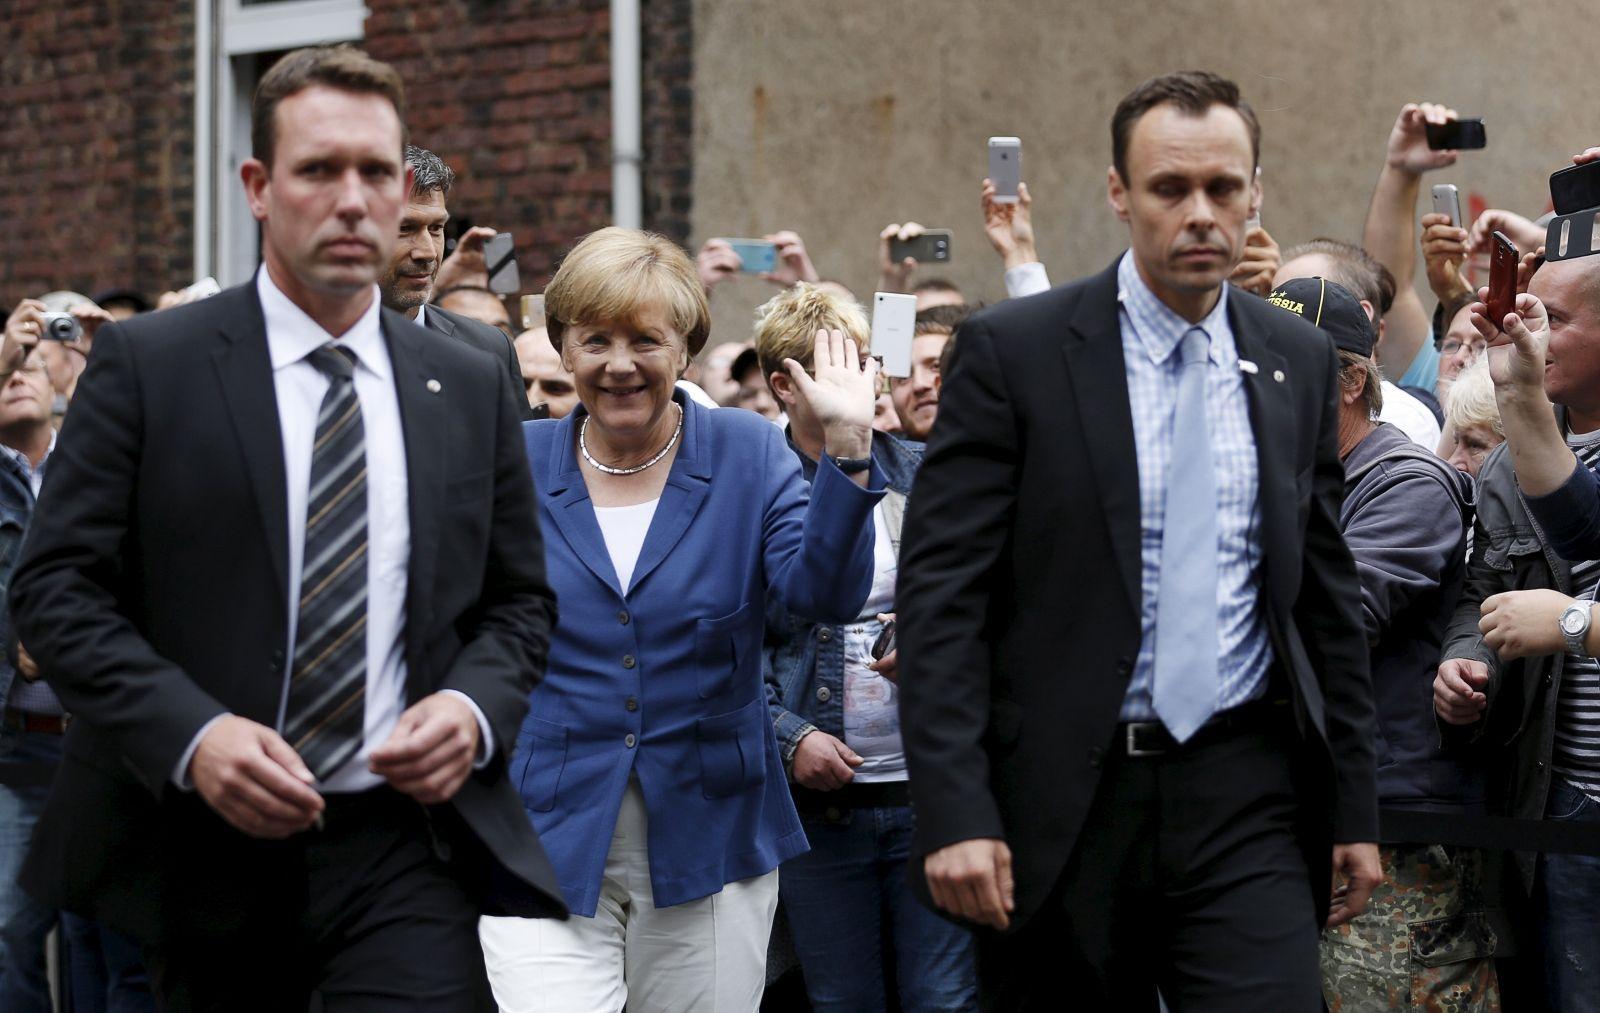 Angel Merkel Booed by far-right